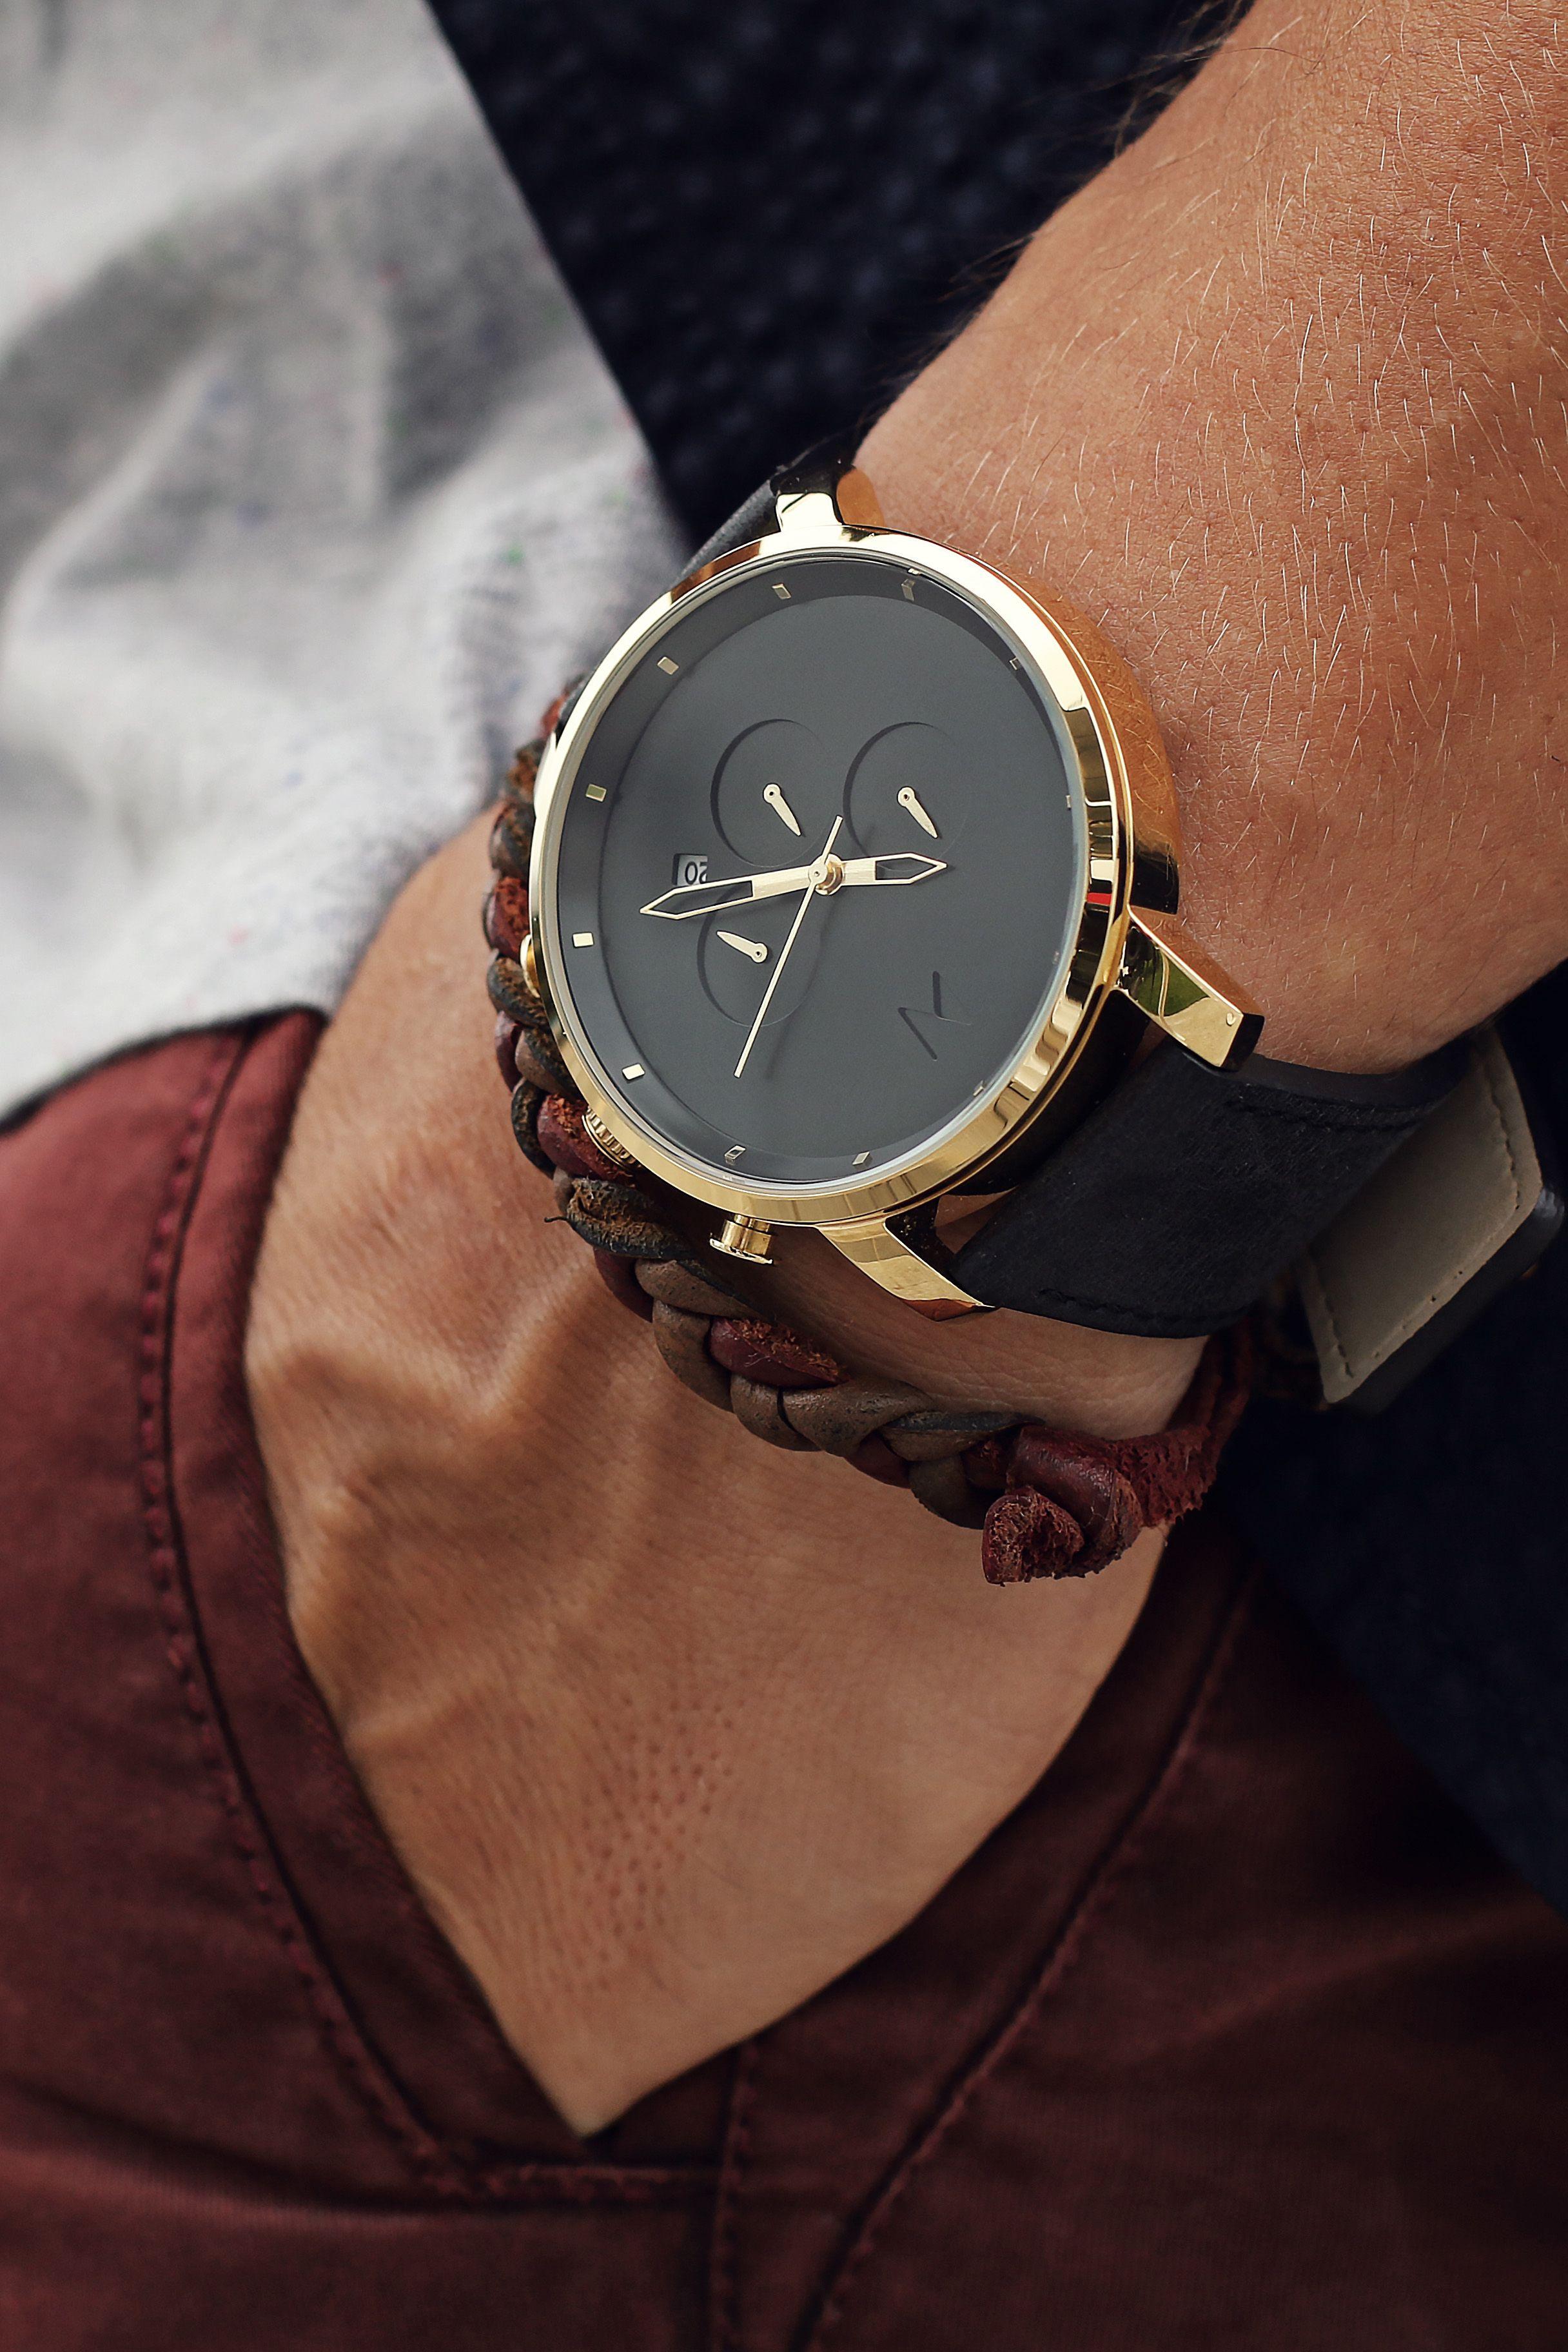 fbe9adea1c9 Chrono Gold Black Leather